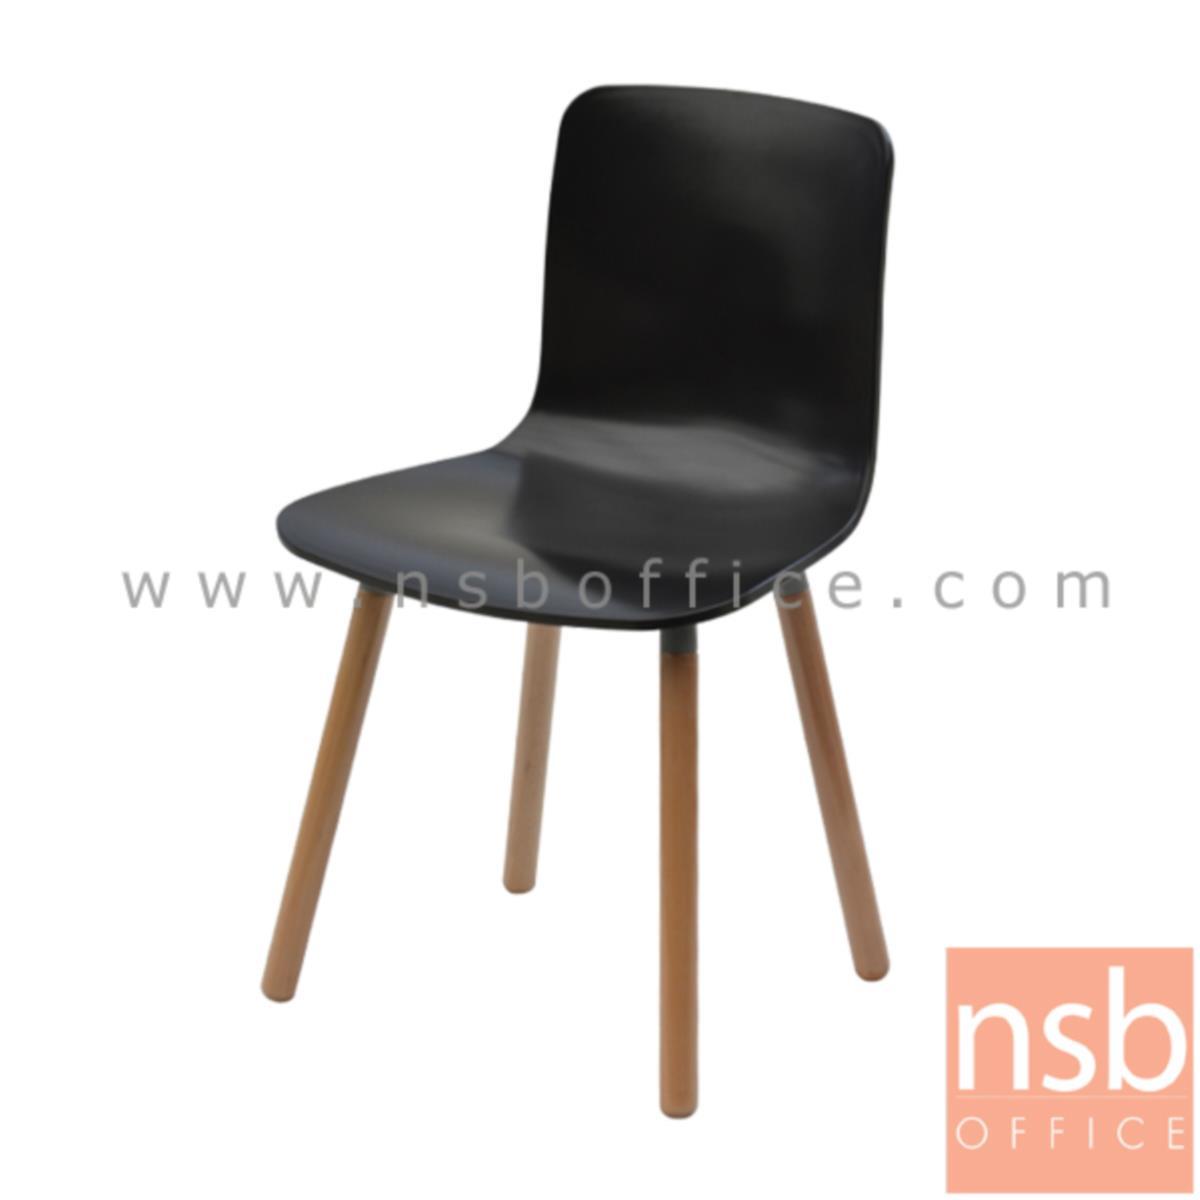 B29A252:เก้าอี้โมเดิร์นพลาสติก(PP) รุ่น NP-1286 ขนาด 47.5W cm. โครงขาไม้